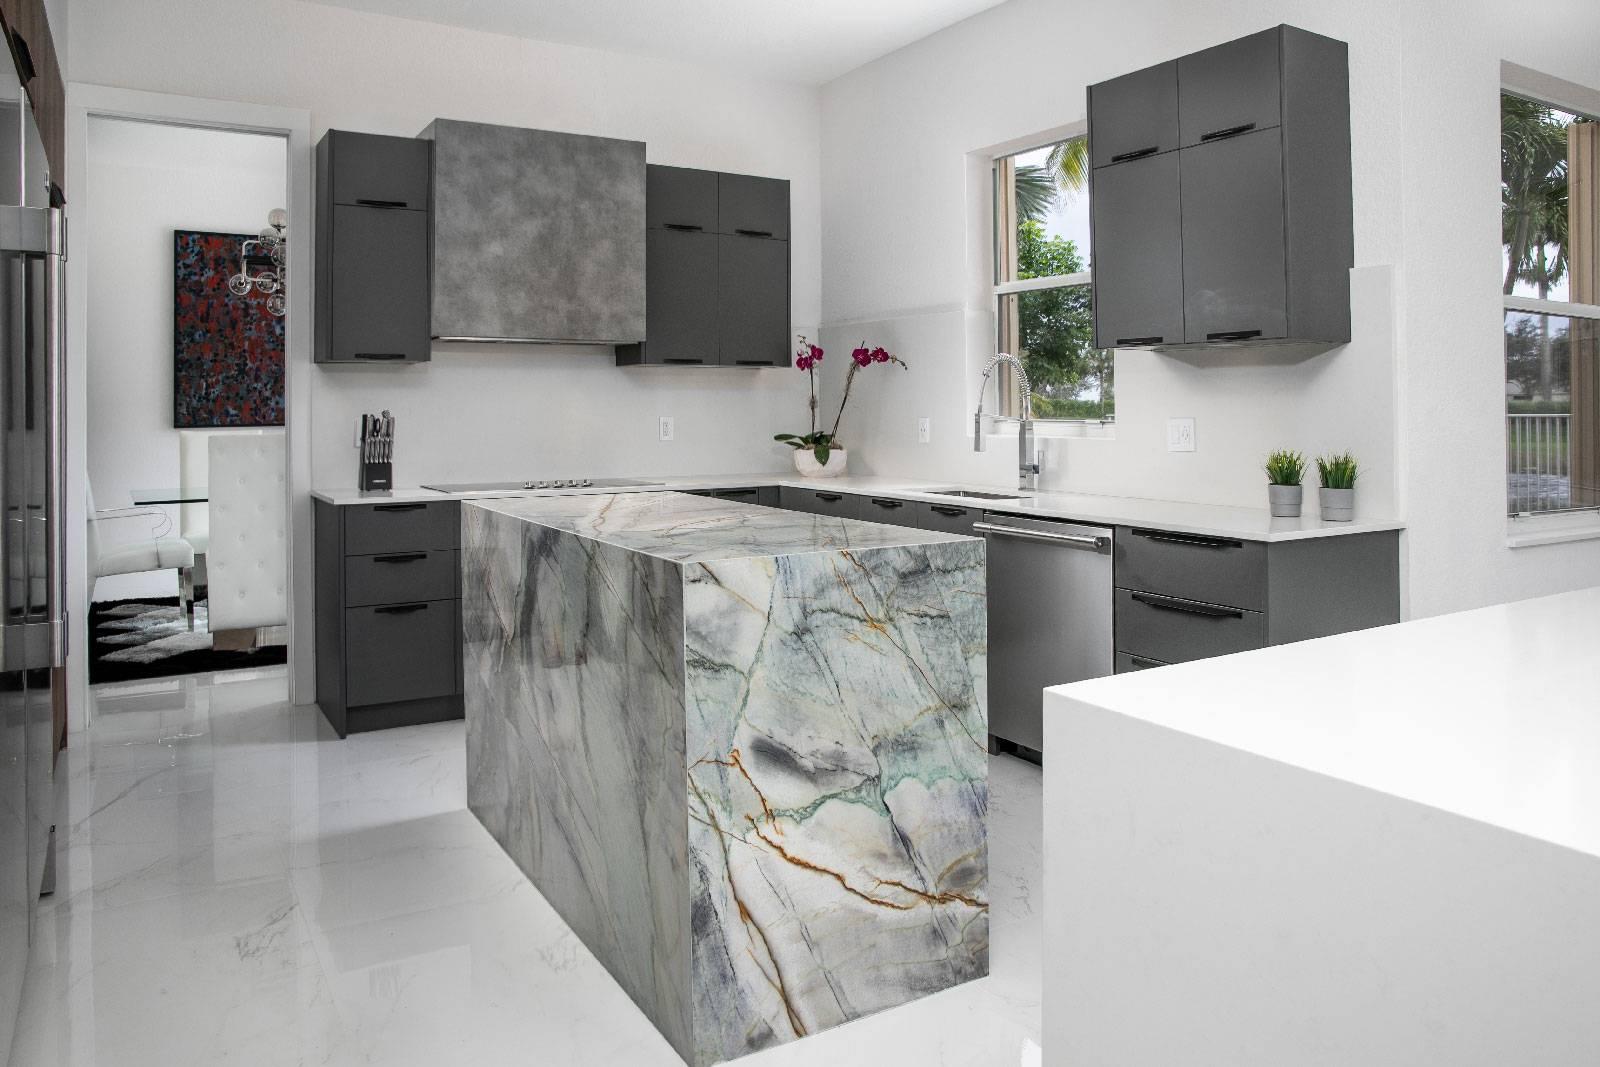 Arizona Shadow Kithchen 10, Primestones® Granite, Quartz, Marble